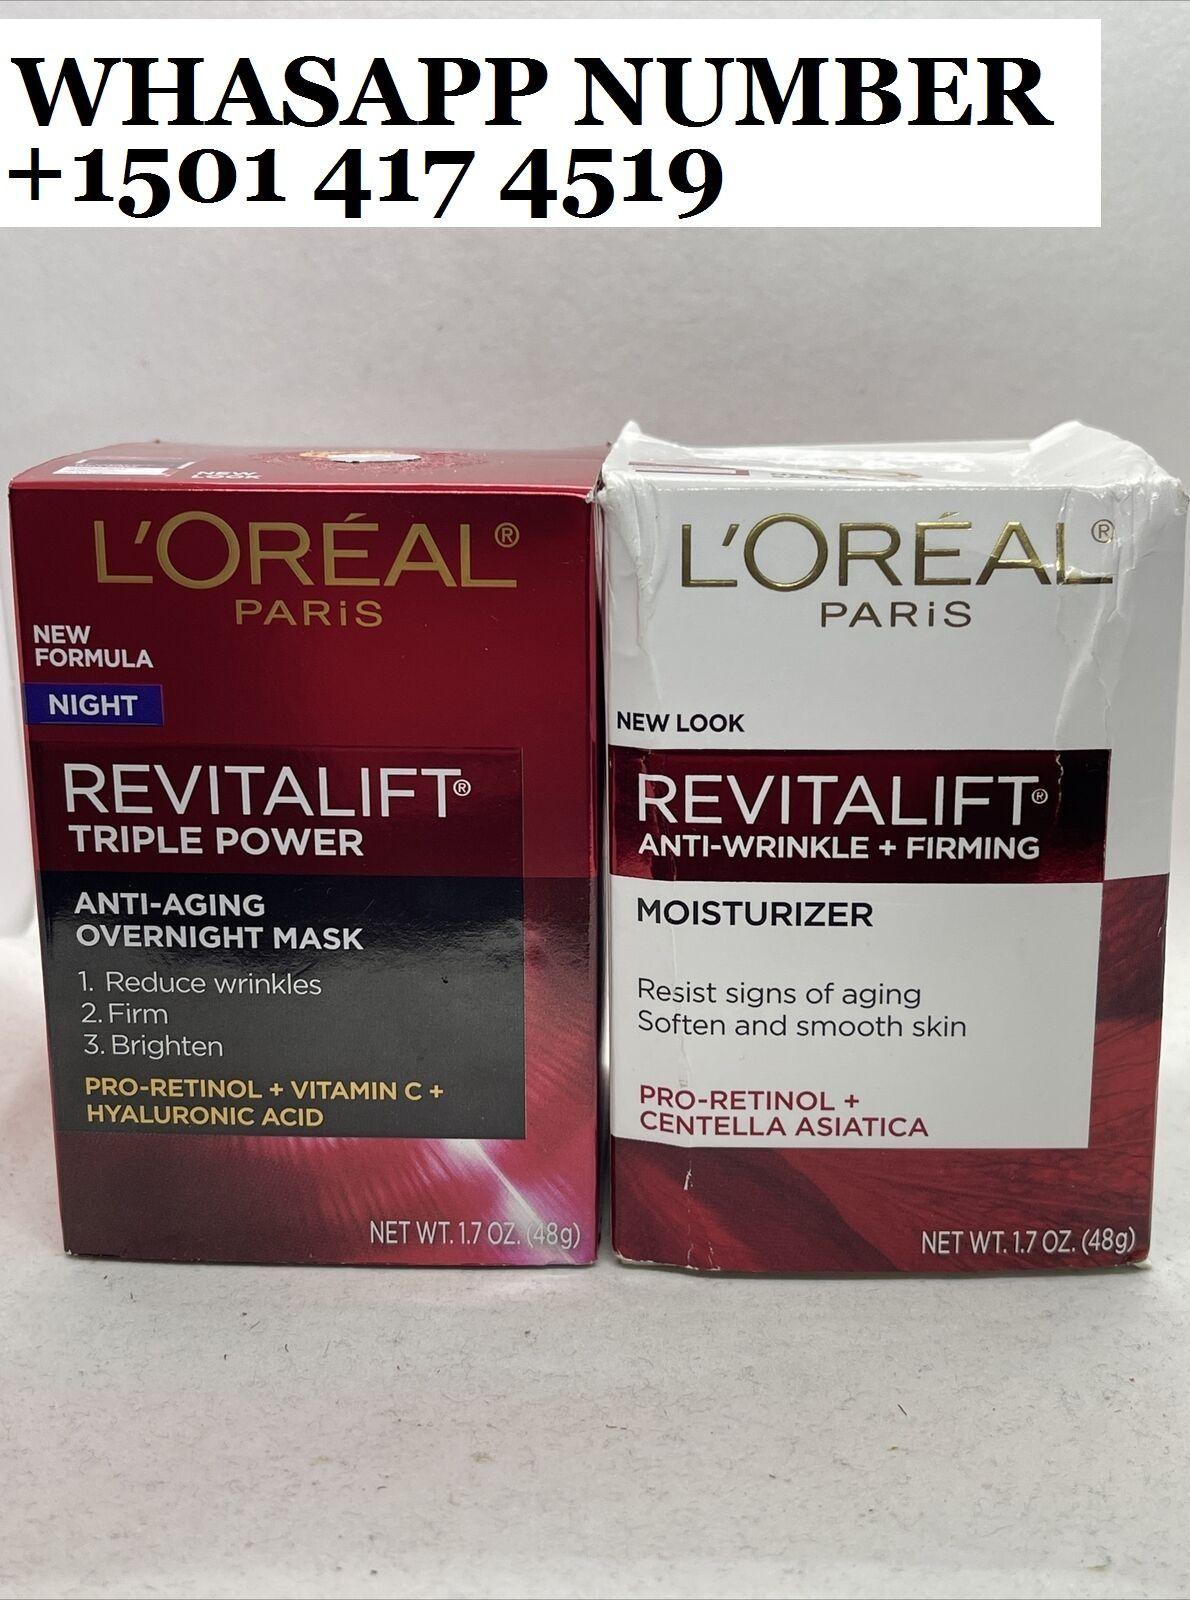 L'Oreal Paris Revitalift Triple Power Anti-Aging Overnight Mask 1.7oz+ Day Cream